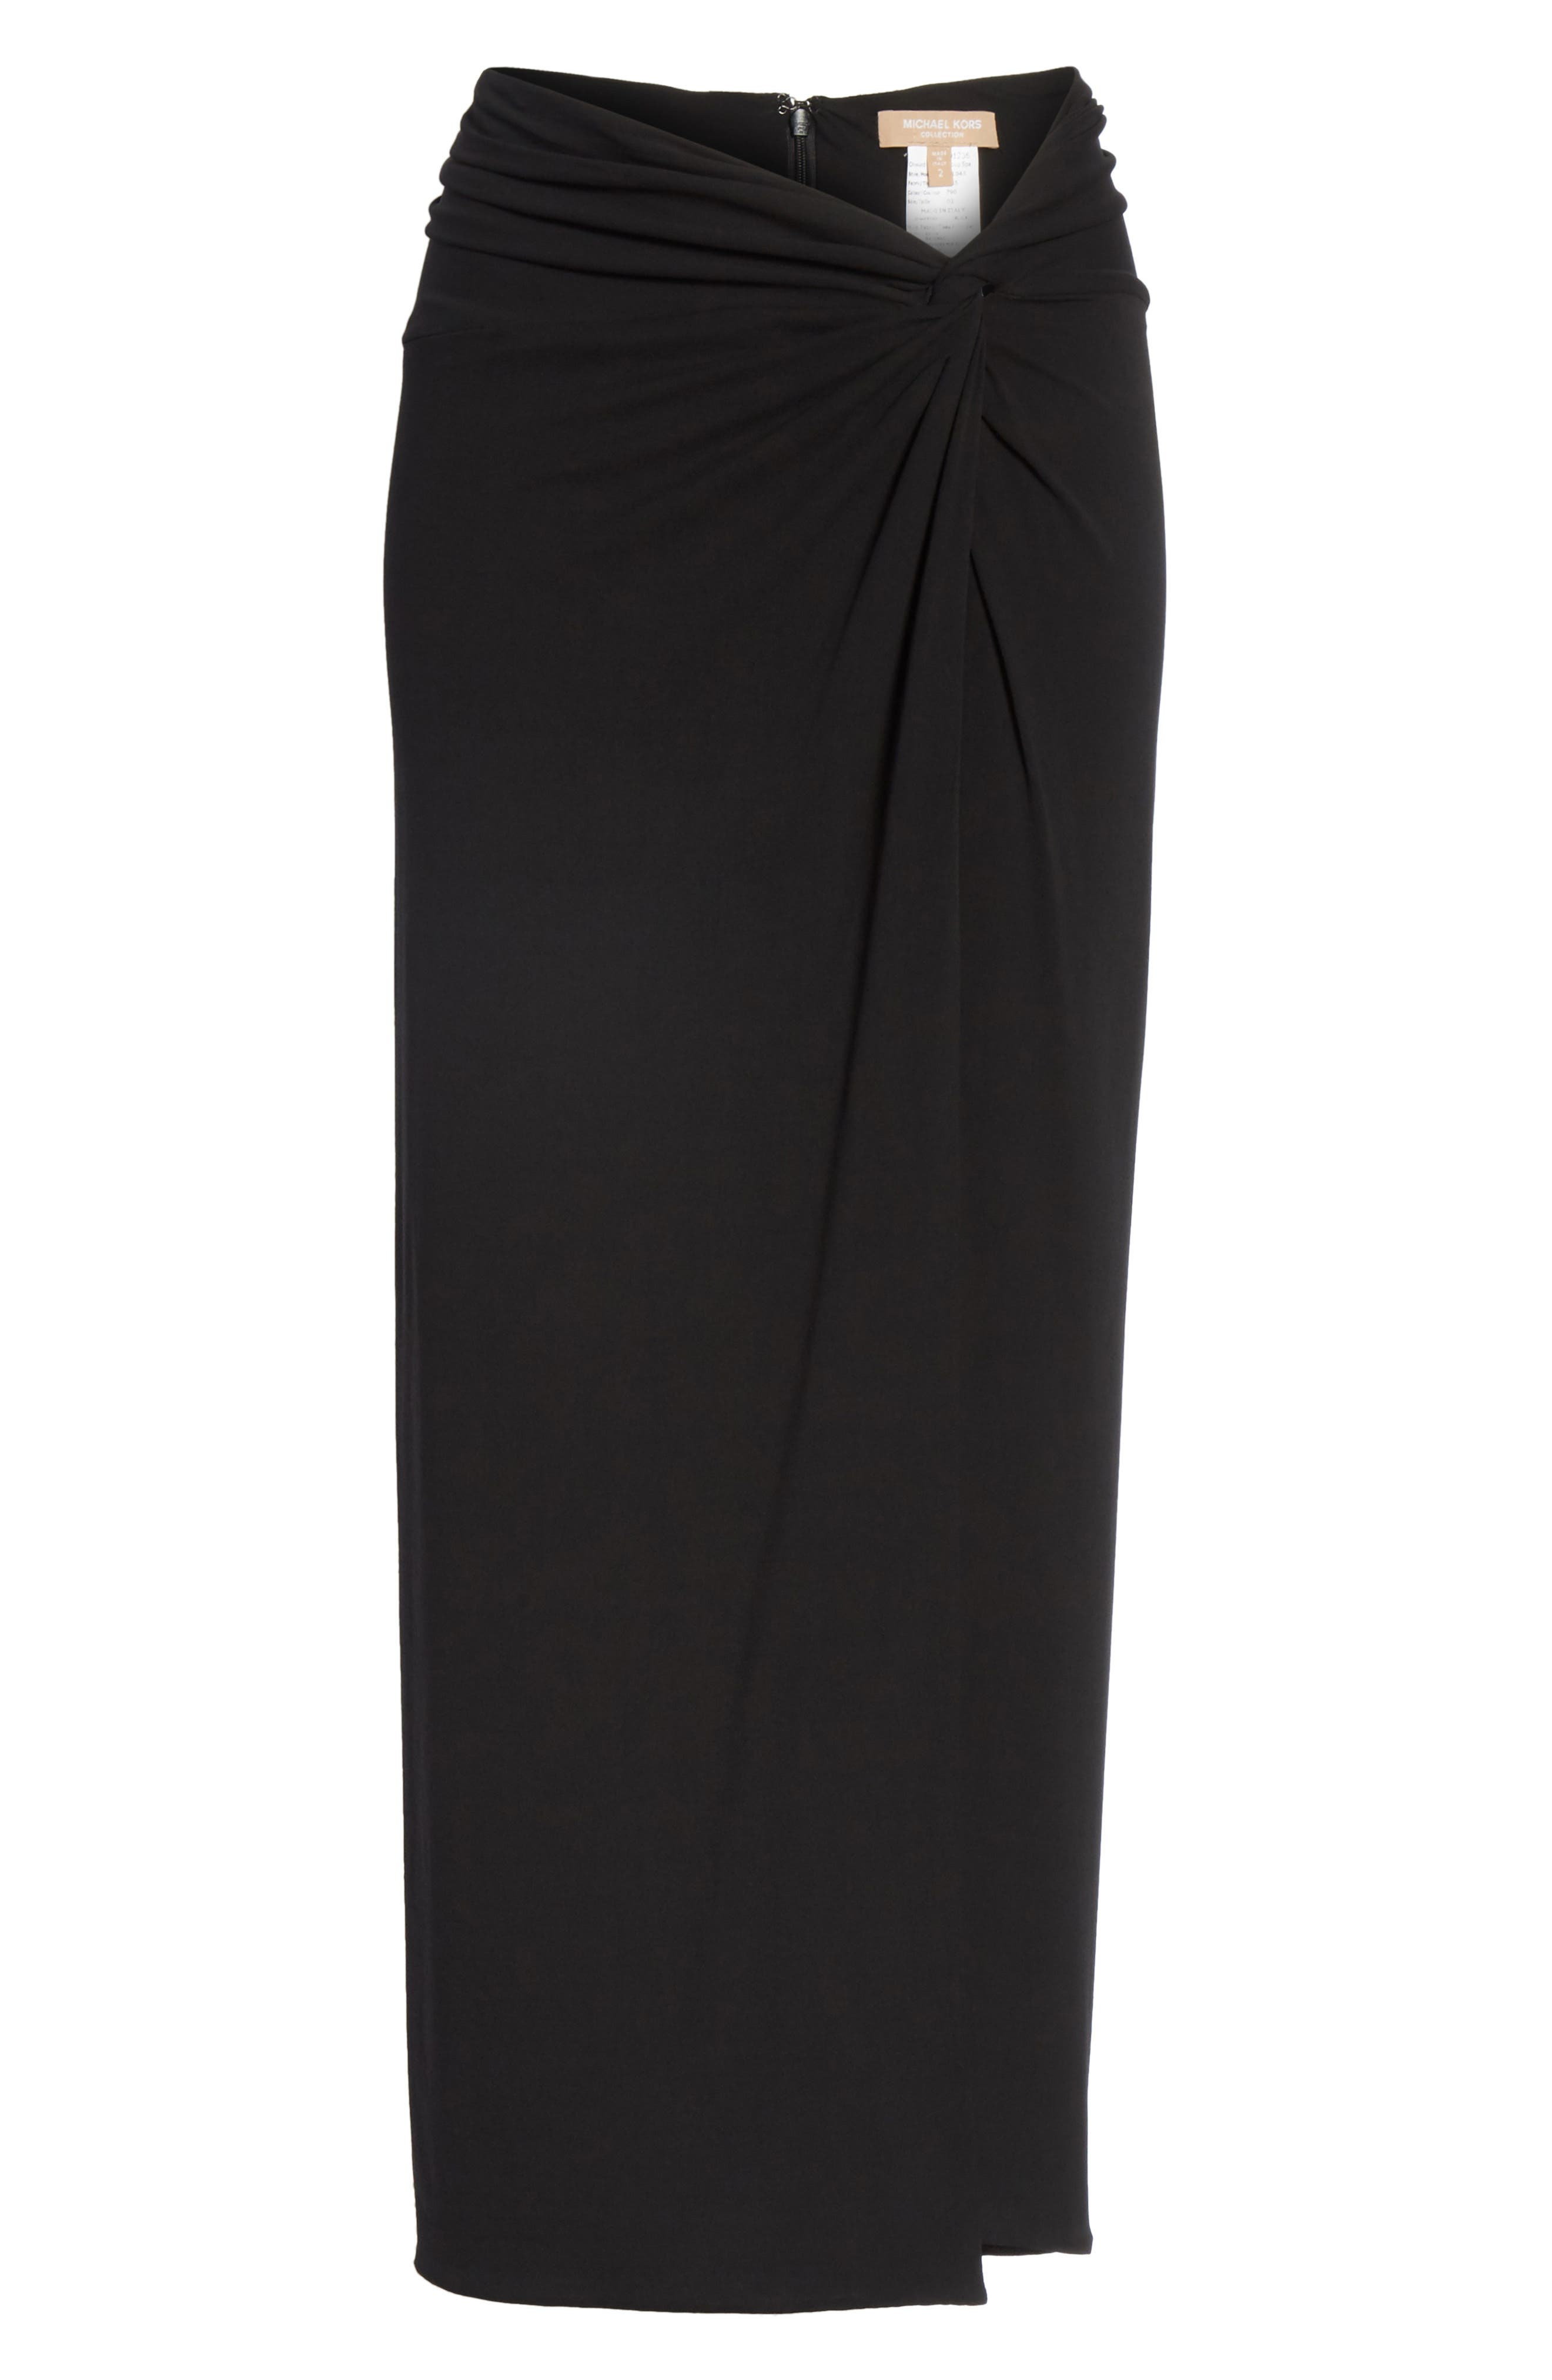 Sarong Midi Skirt,                             Alternate thumbnail 7, color,                             Black